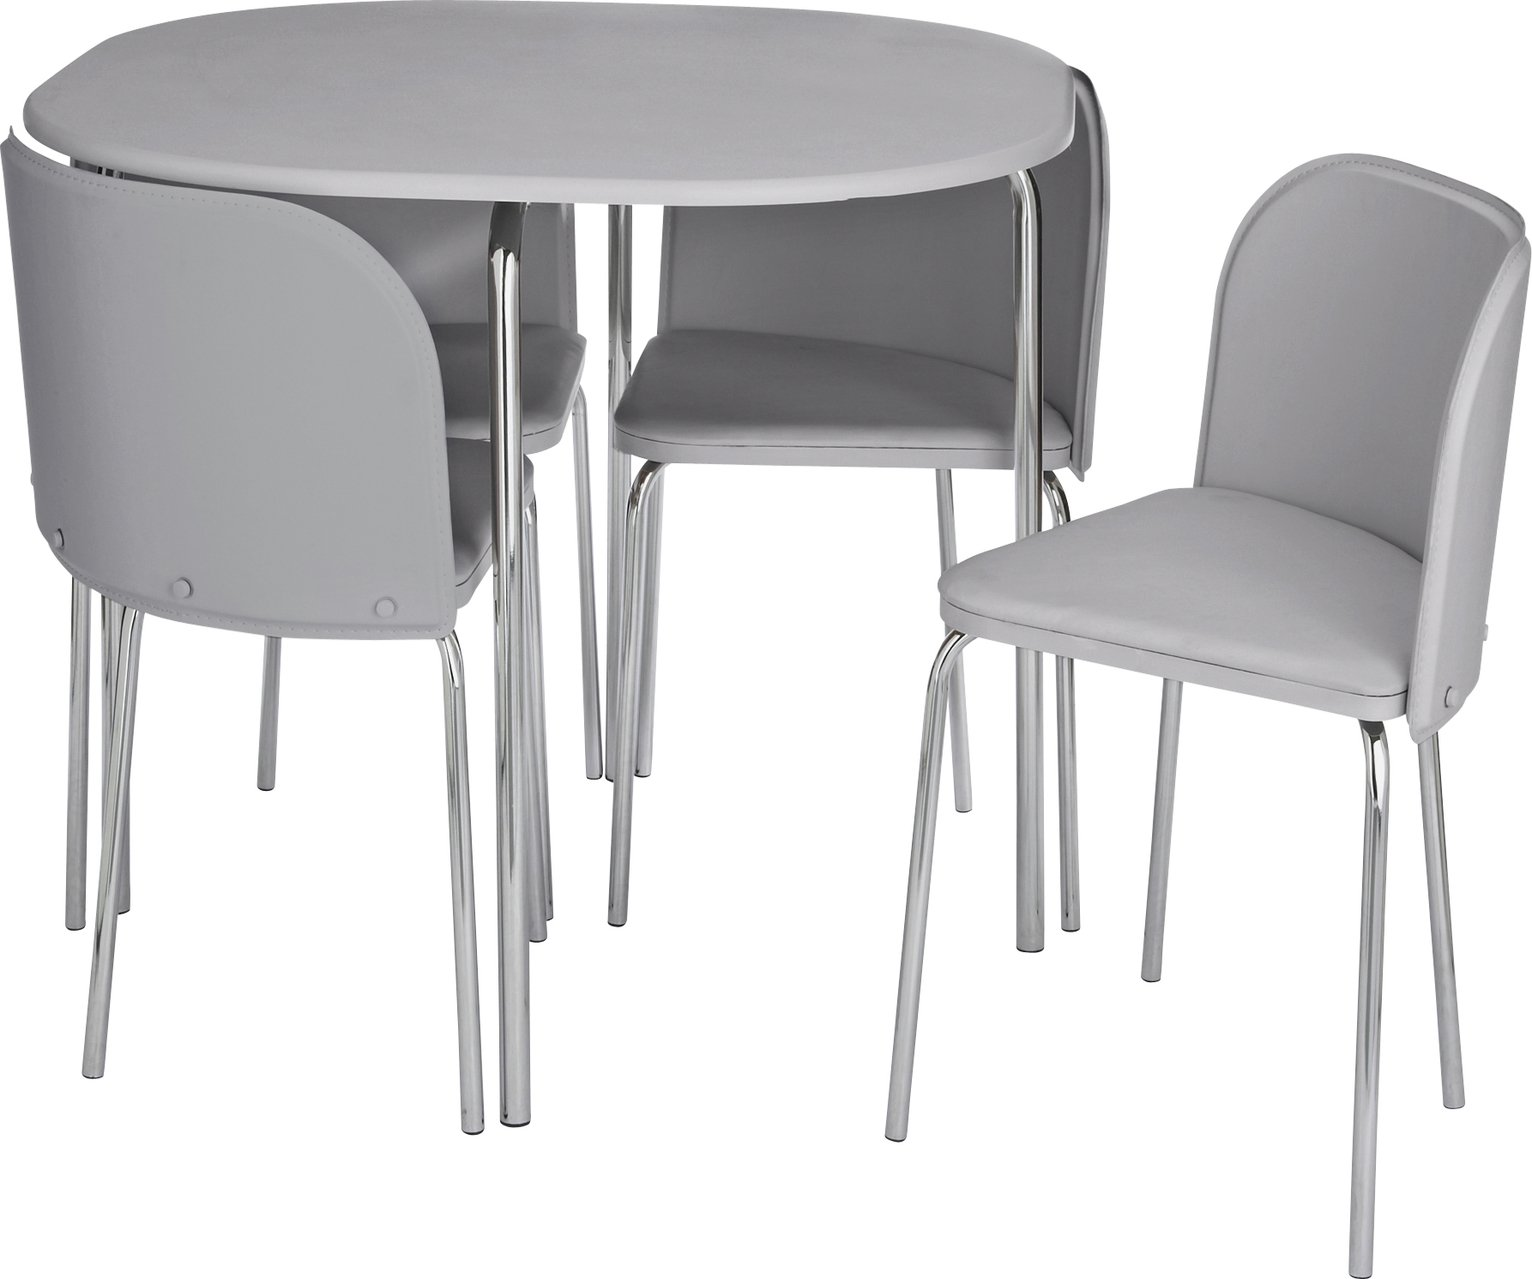 buy argos home amparo space saving dining table 4 chairs rh argos co uk space saving kitchen table and chairs ikea space saver kitchen table set